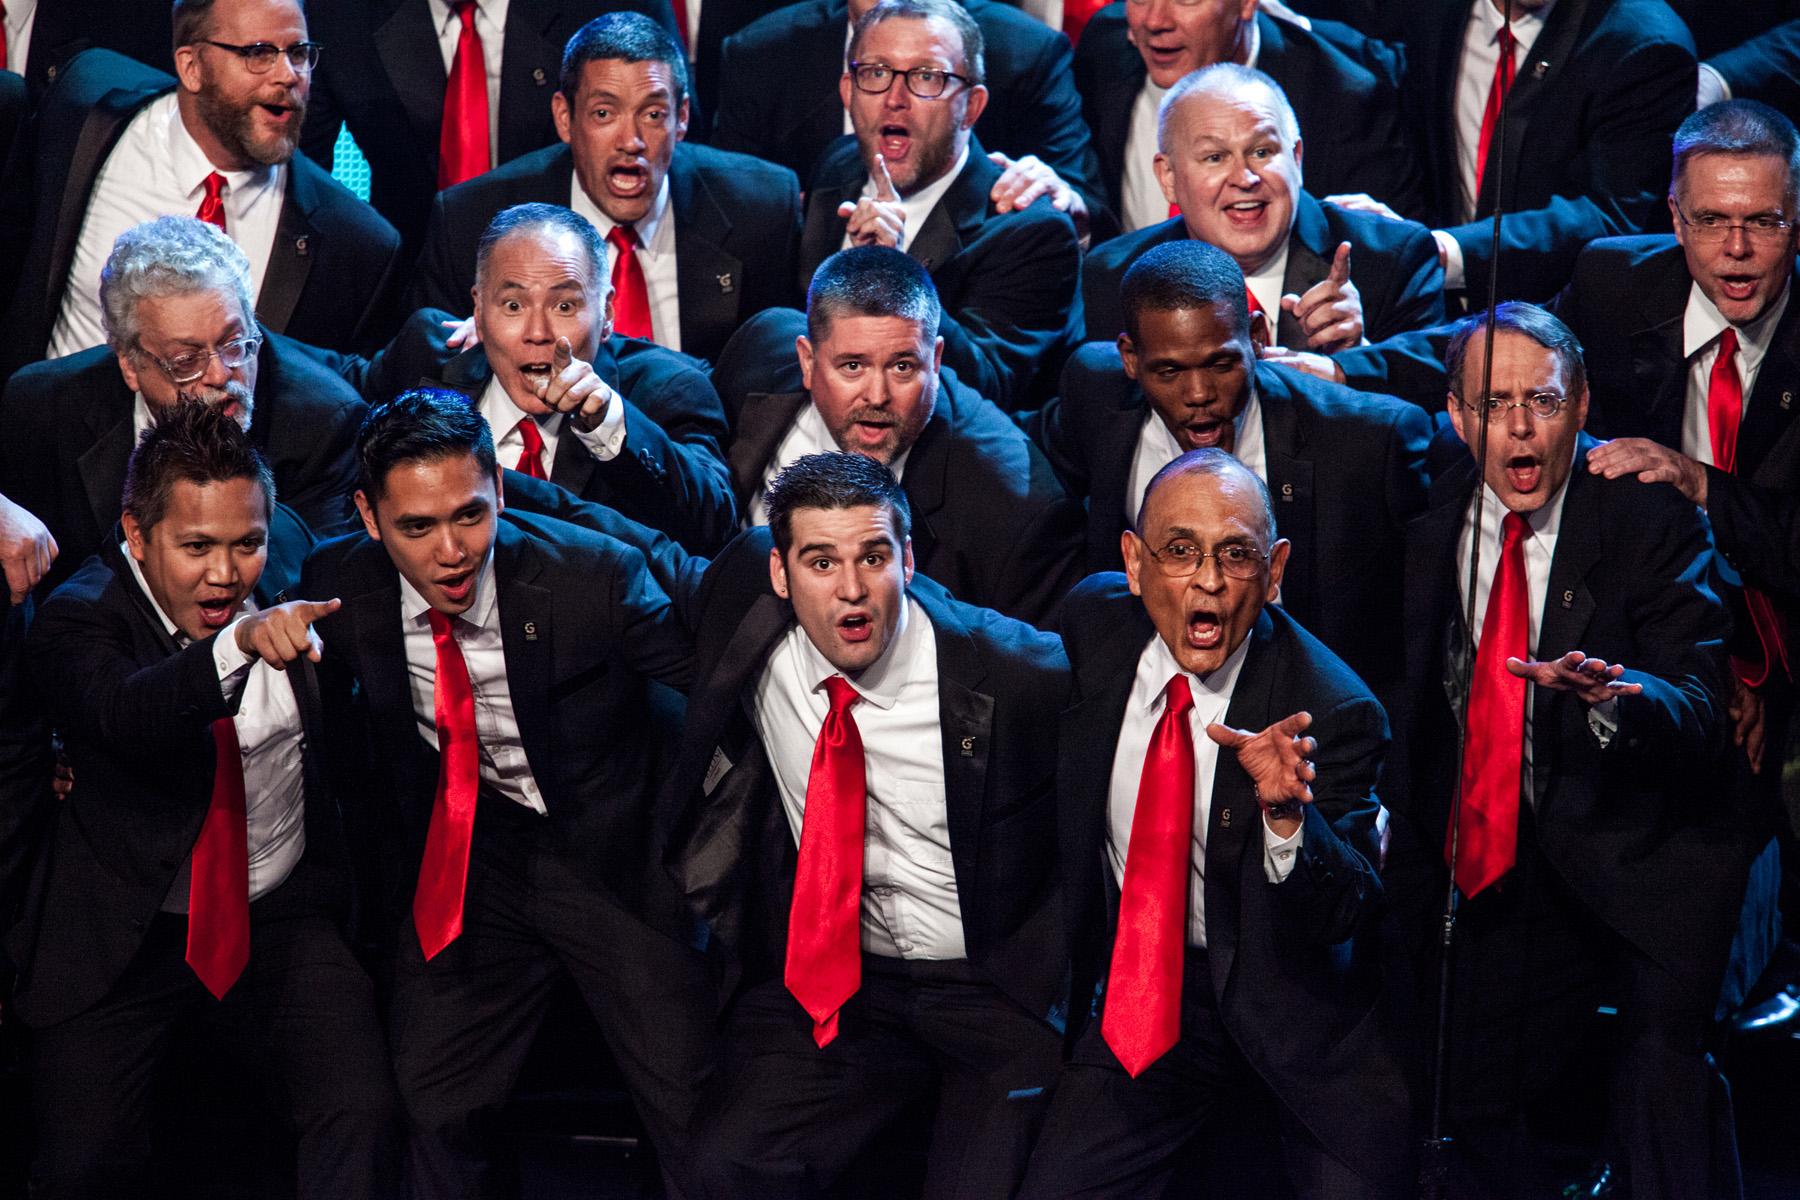 Gay men's chorus of los angeles presents holiday spectacular